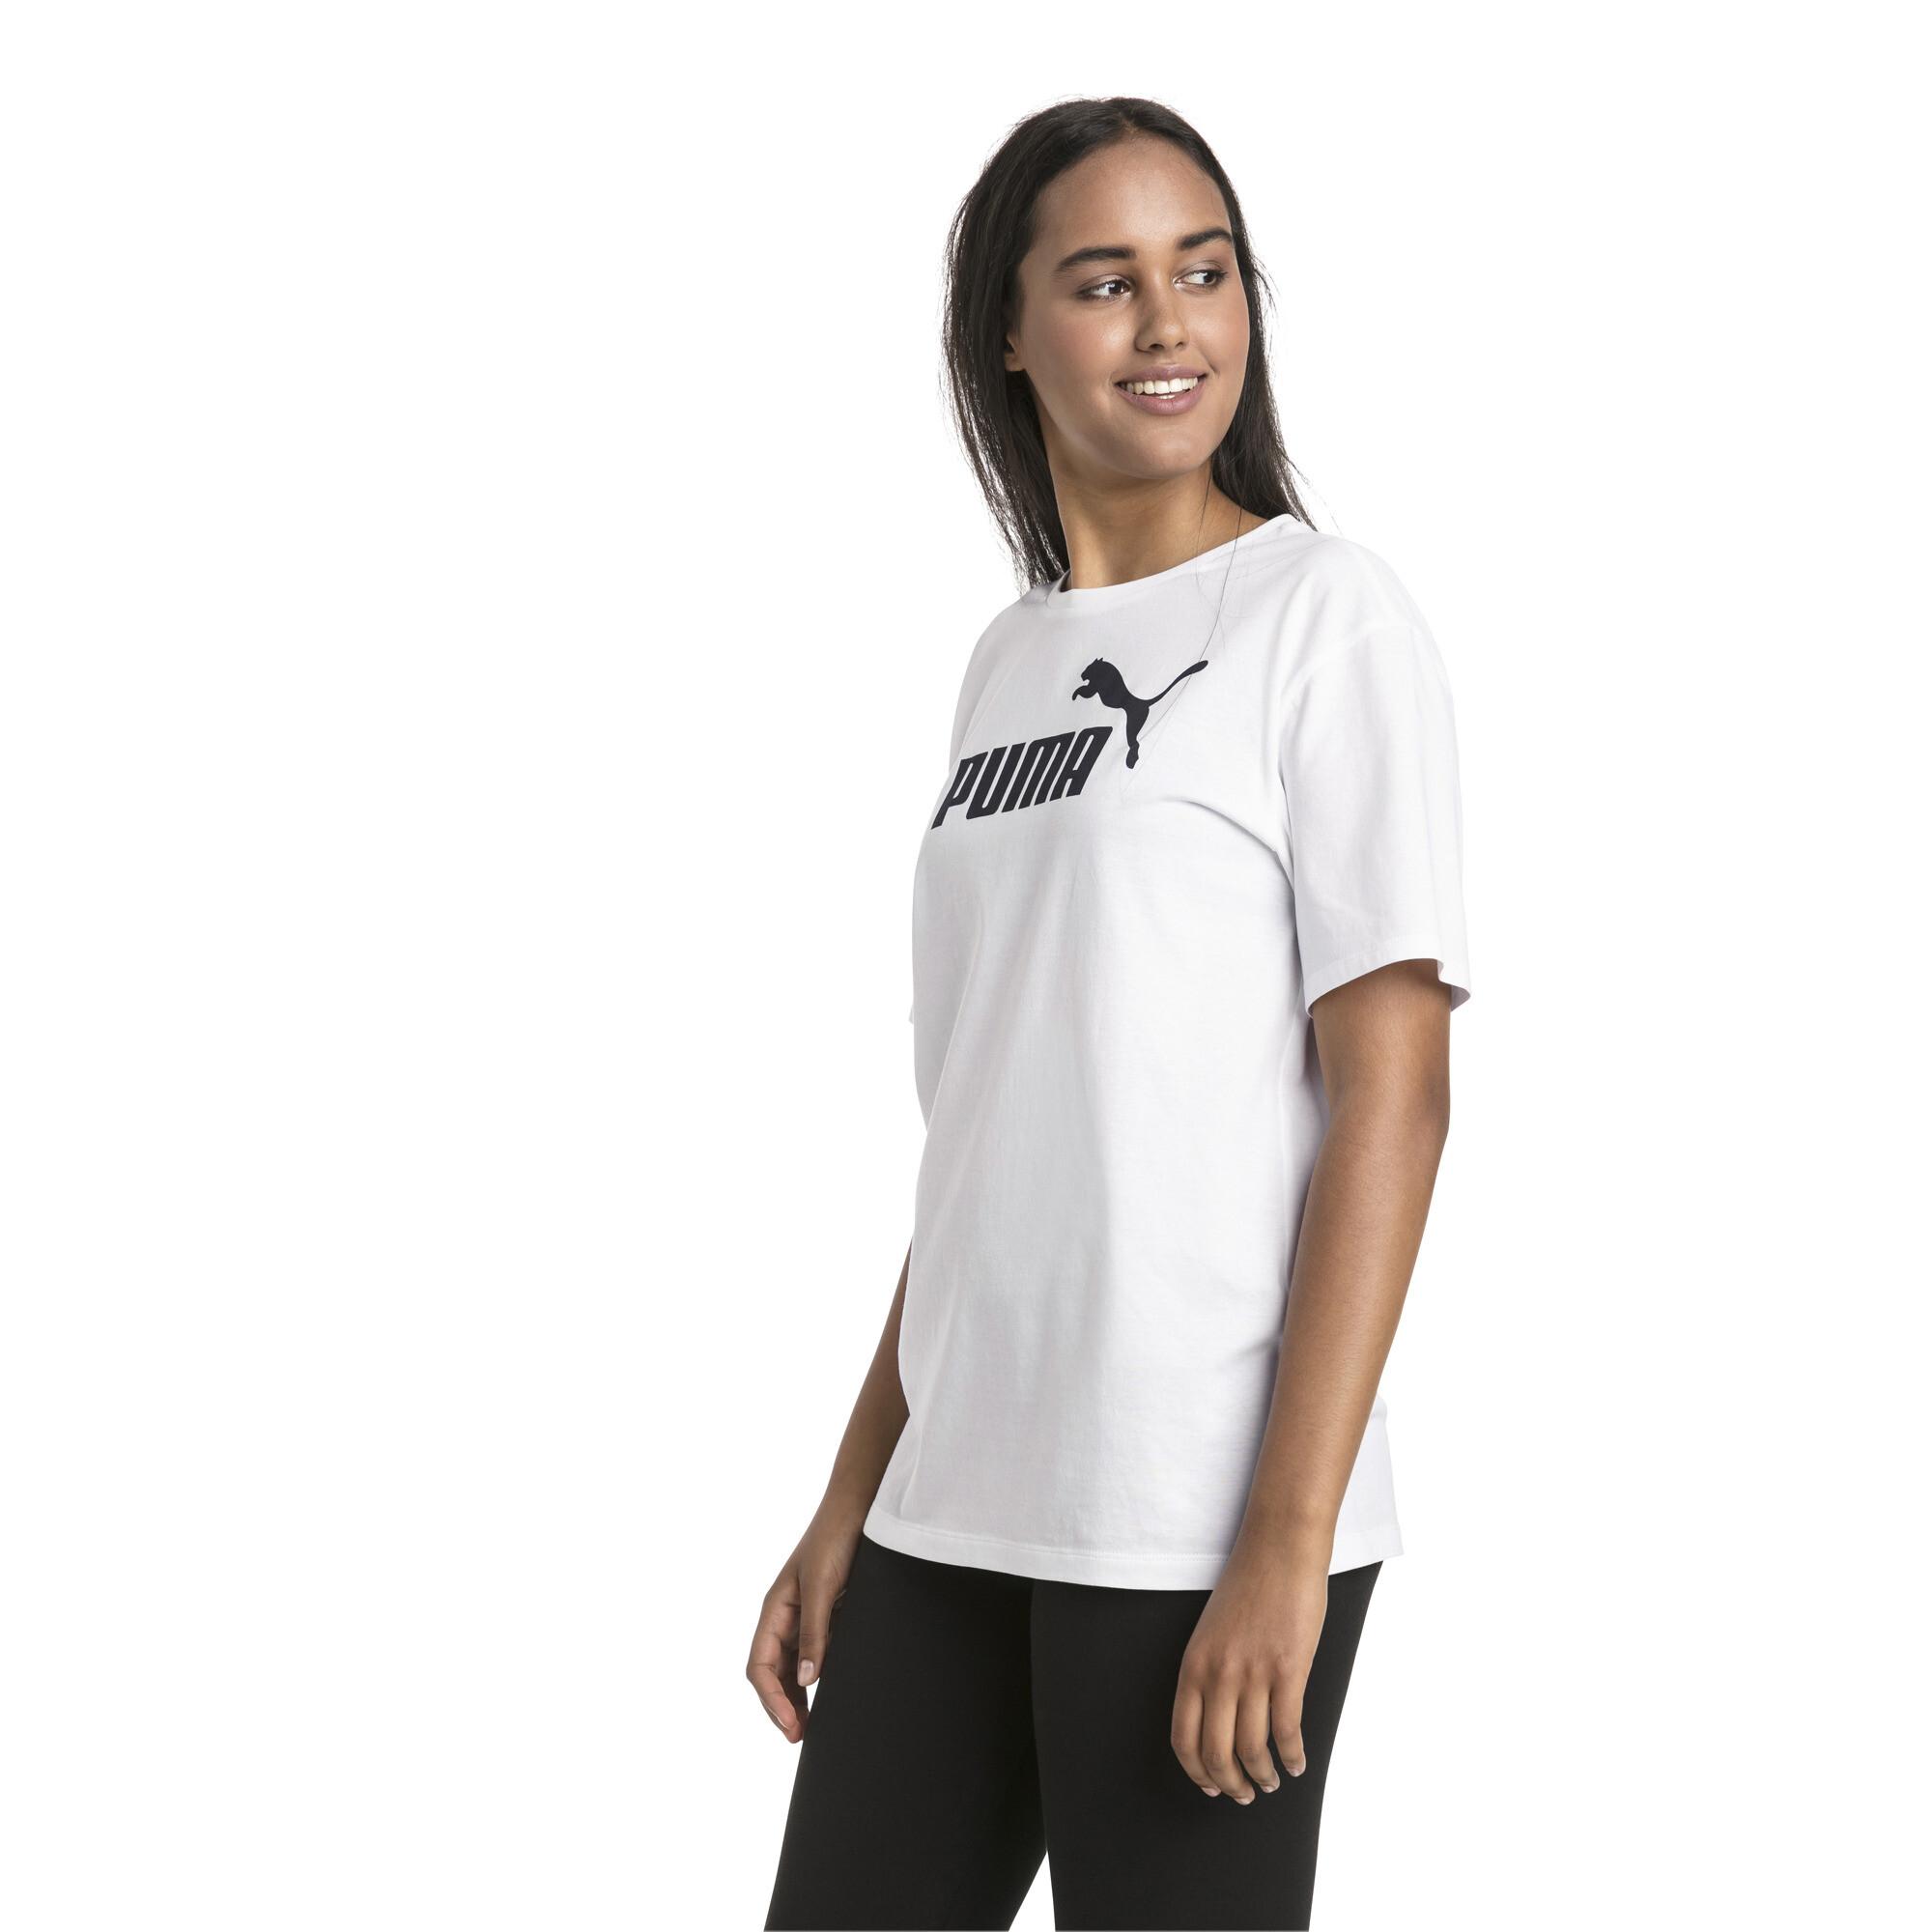 Activewear Tops Logo Womens Ladies Sports Fashion Boyfriend T-shirt Tee Puma Essential Shirts